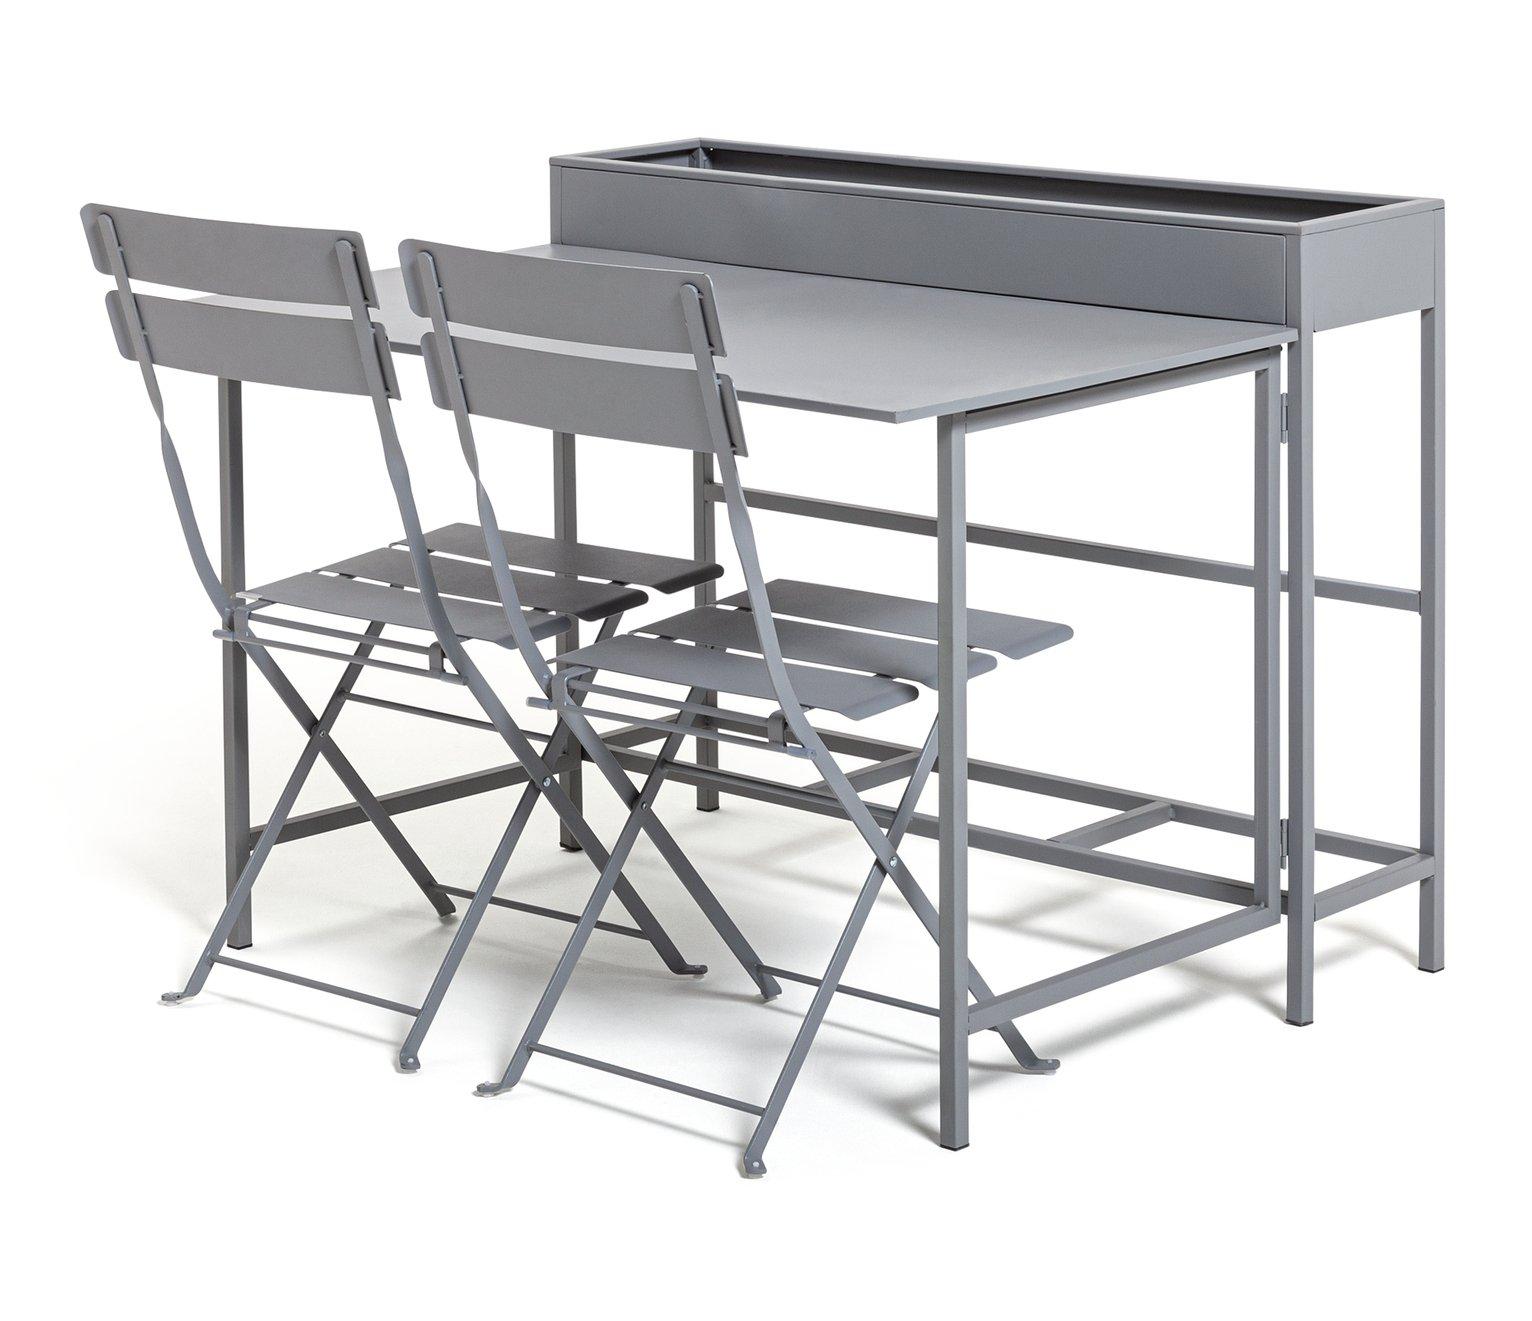 Habitat Trough 2 Seater Bistro Set - Grey